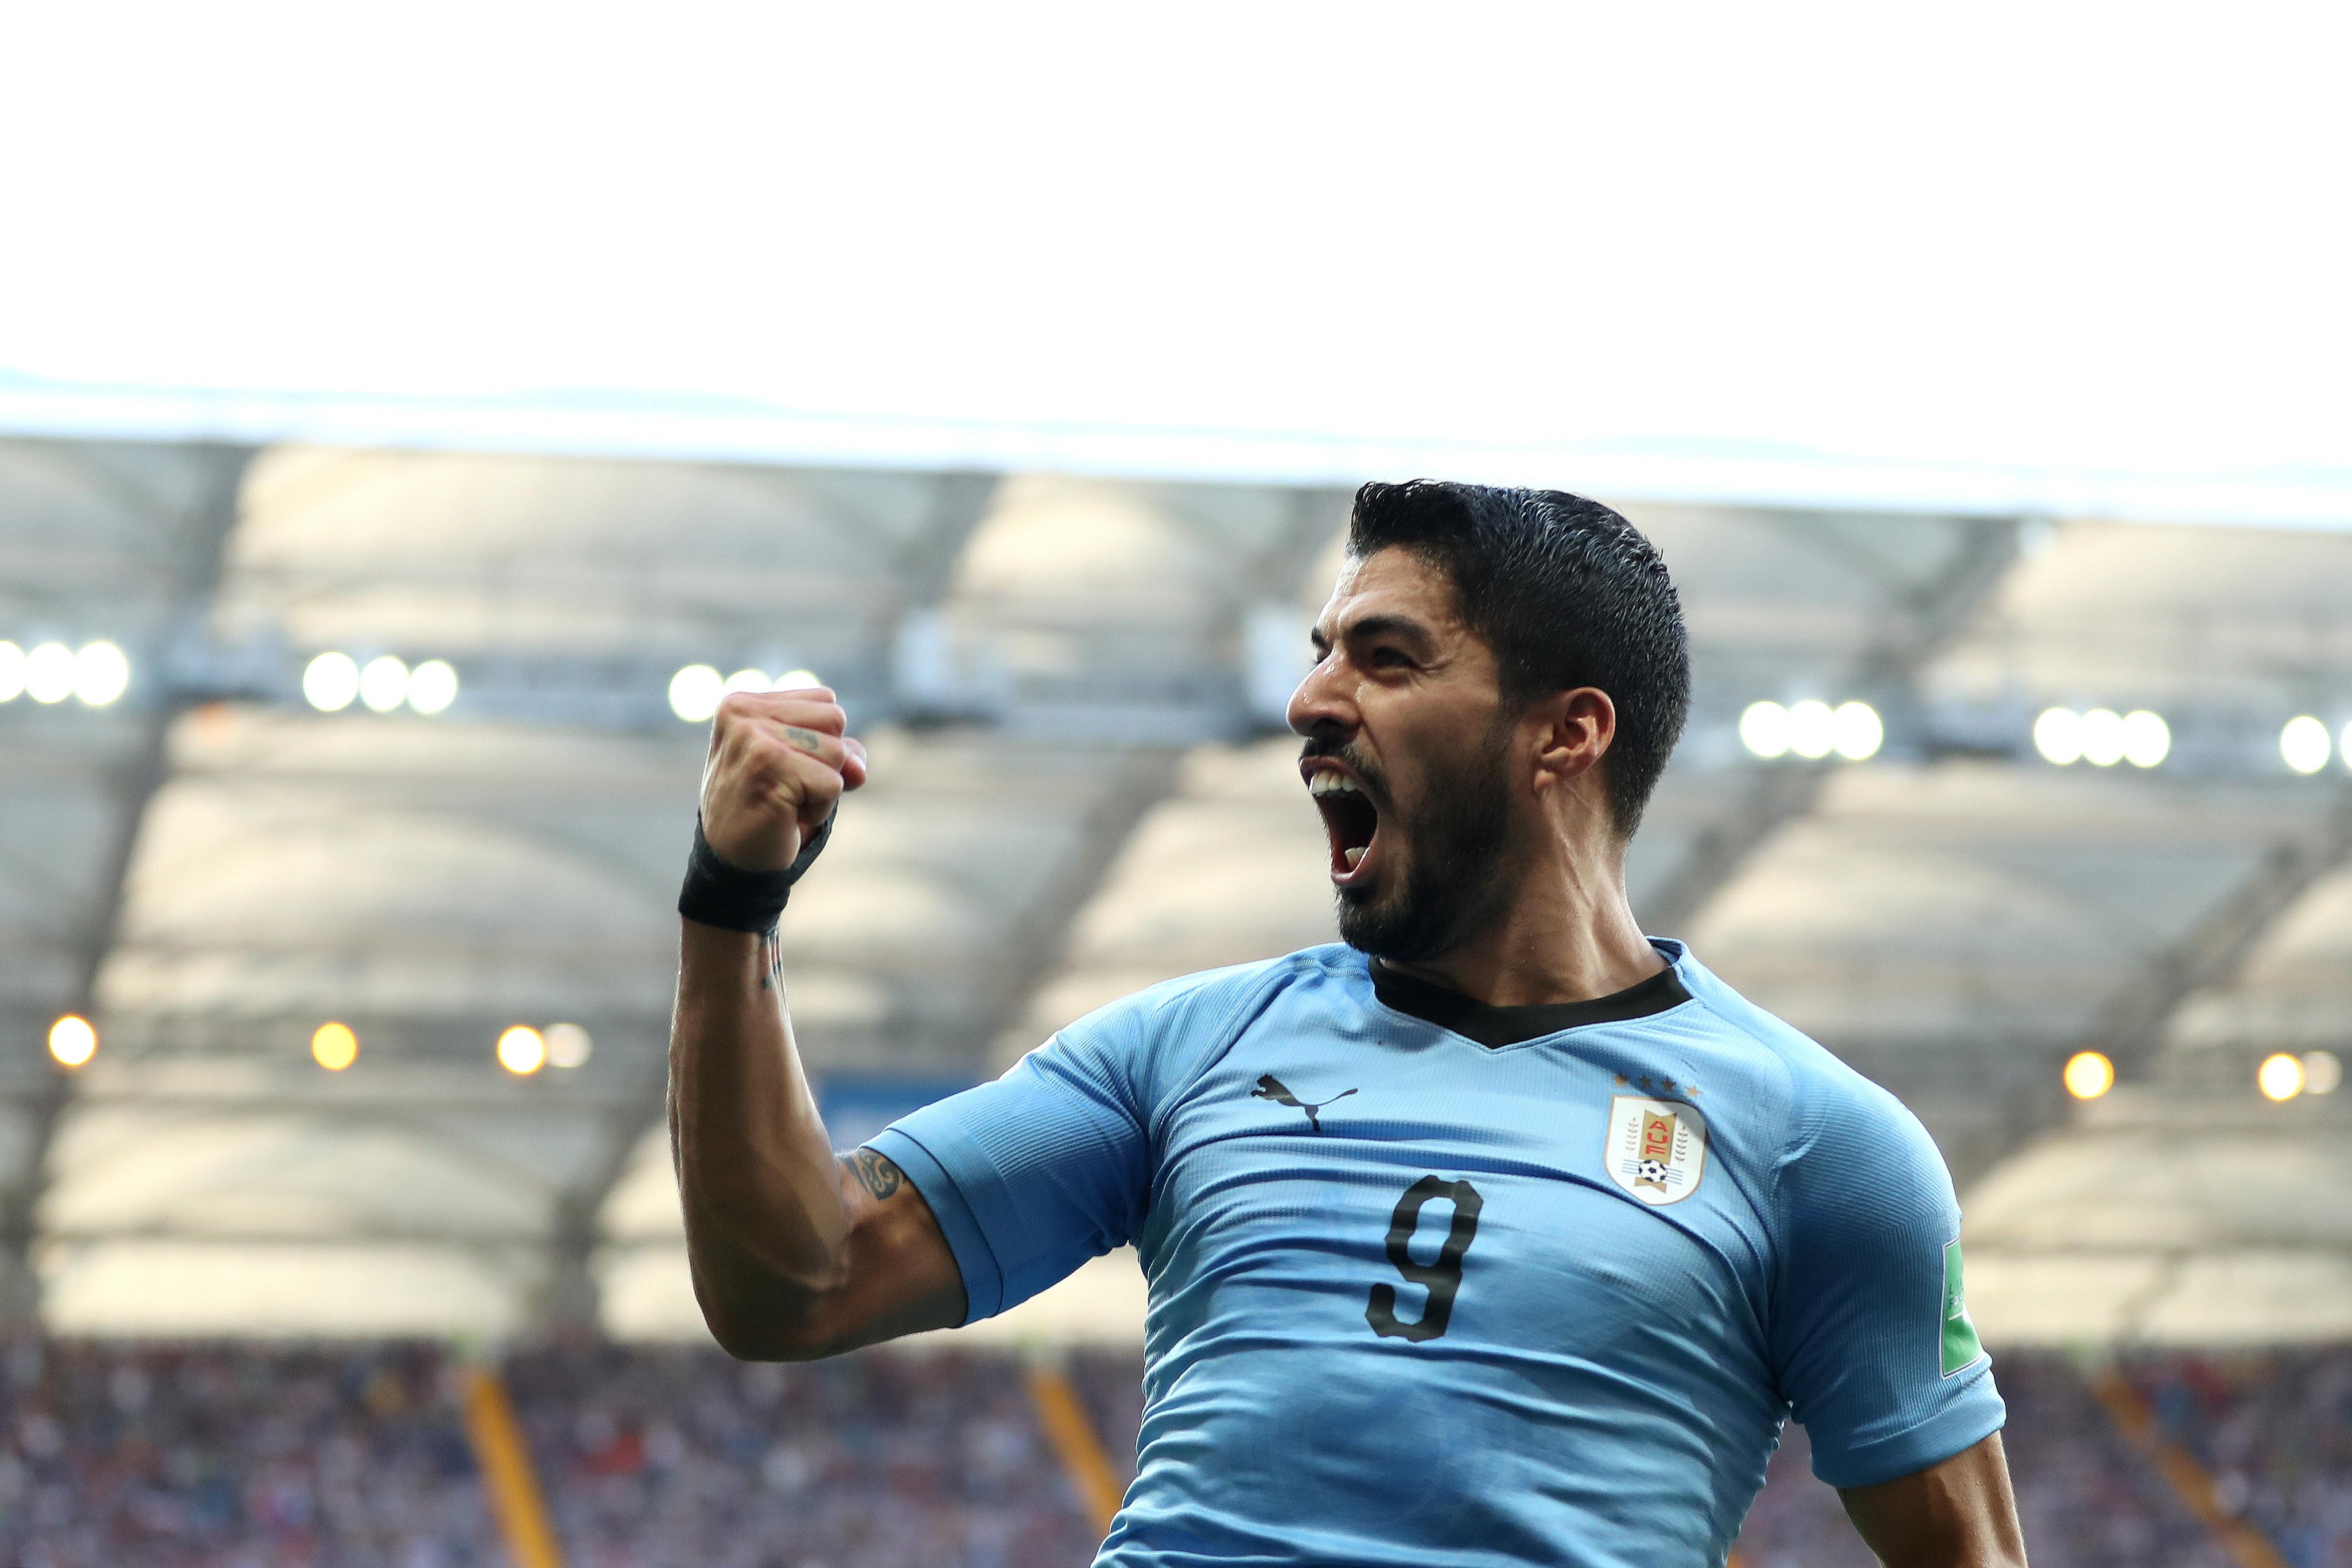 Uruguay Arabia Saudita Rusia 2018 asi quedó